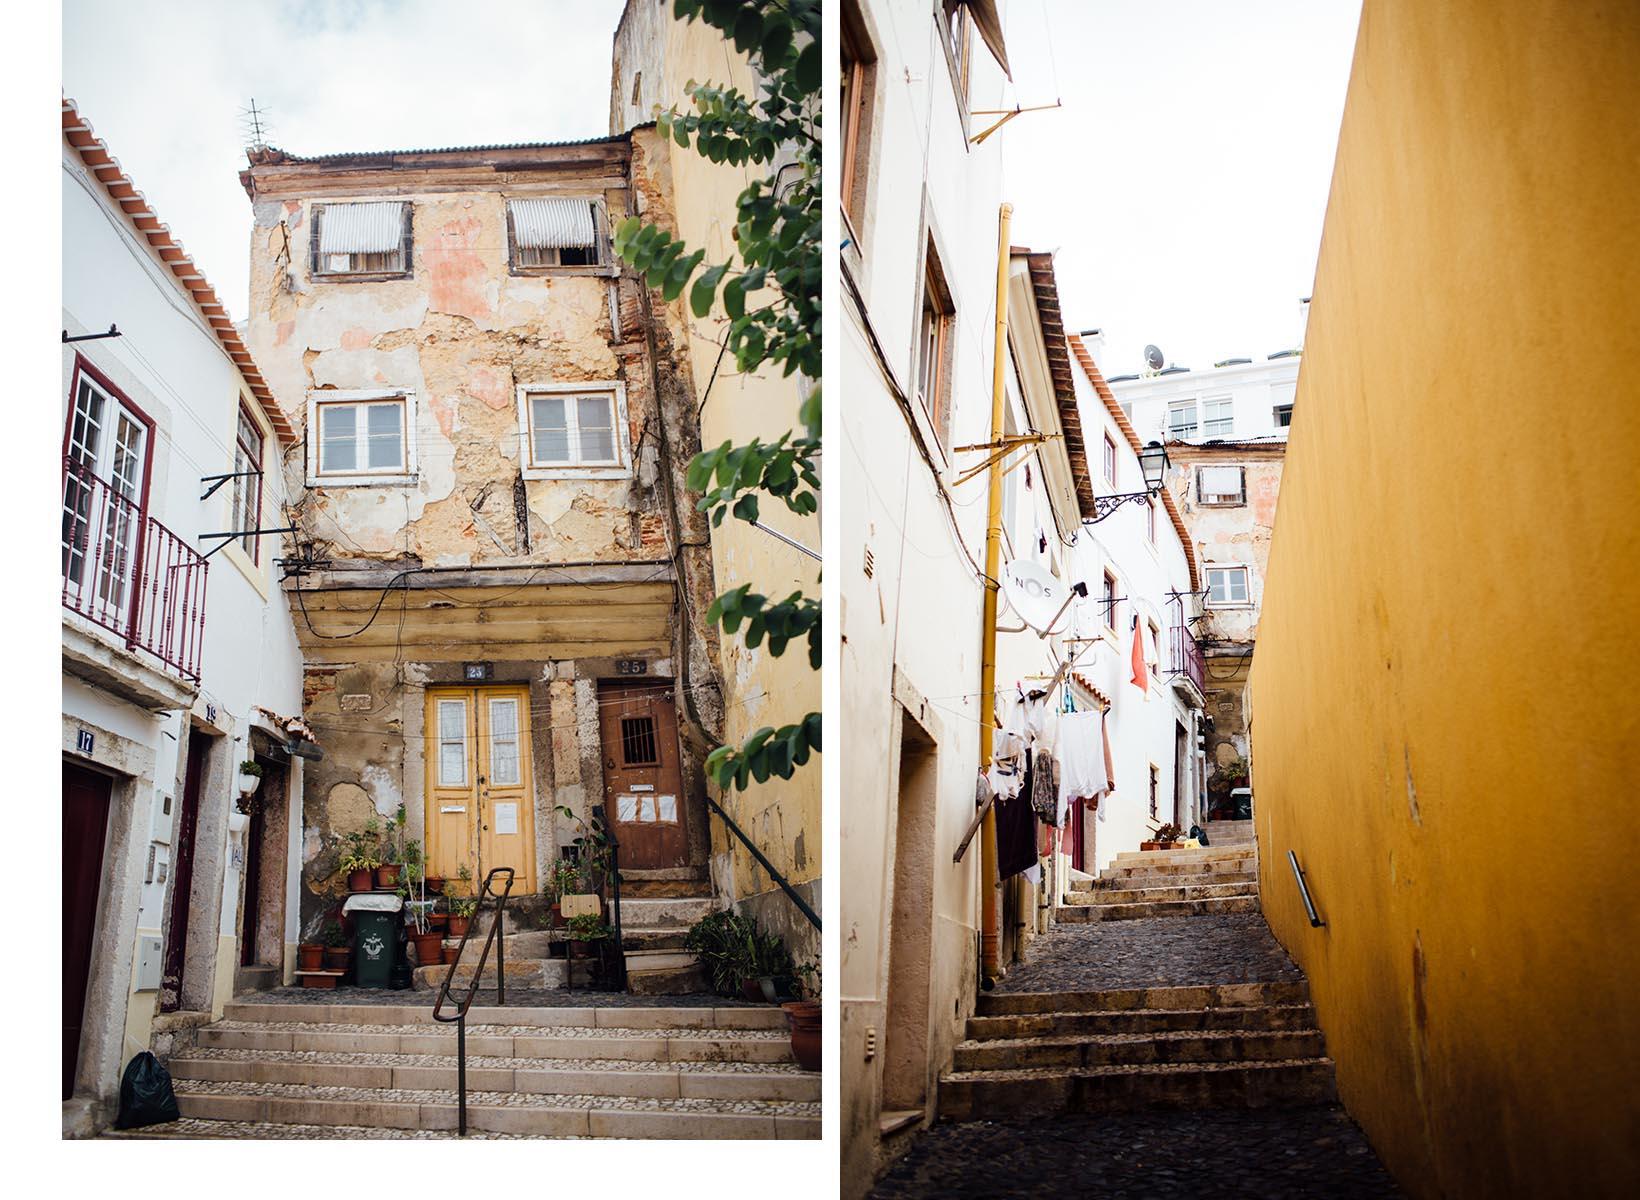 lissabon_streets_06.jpg